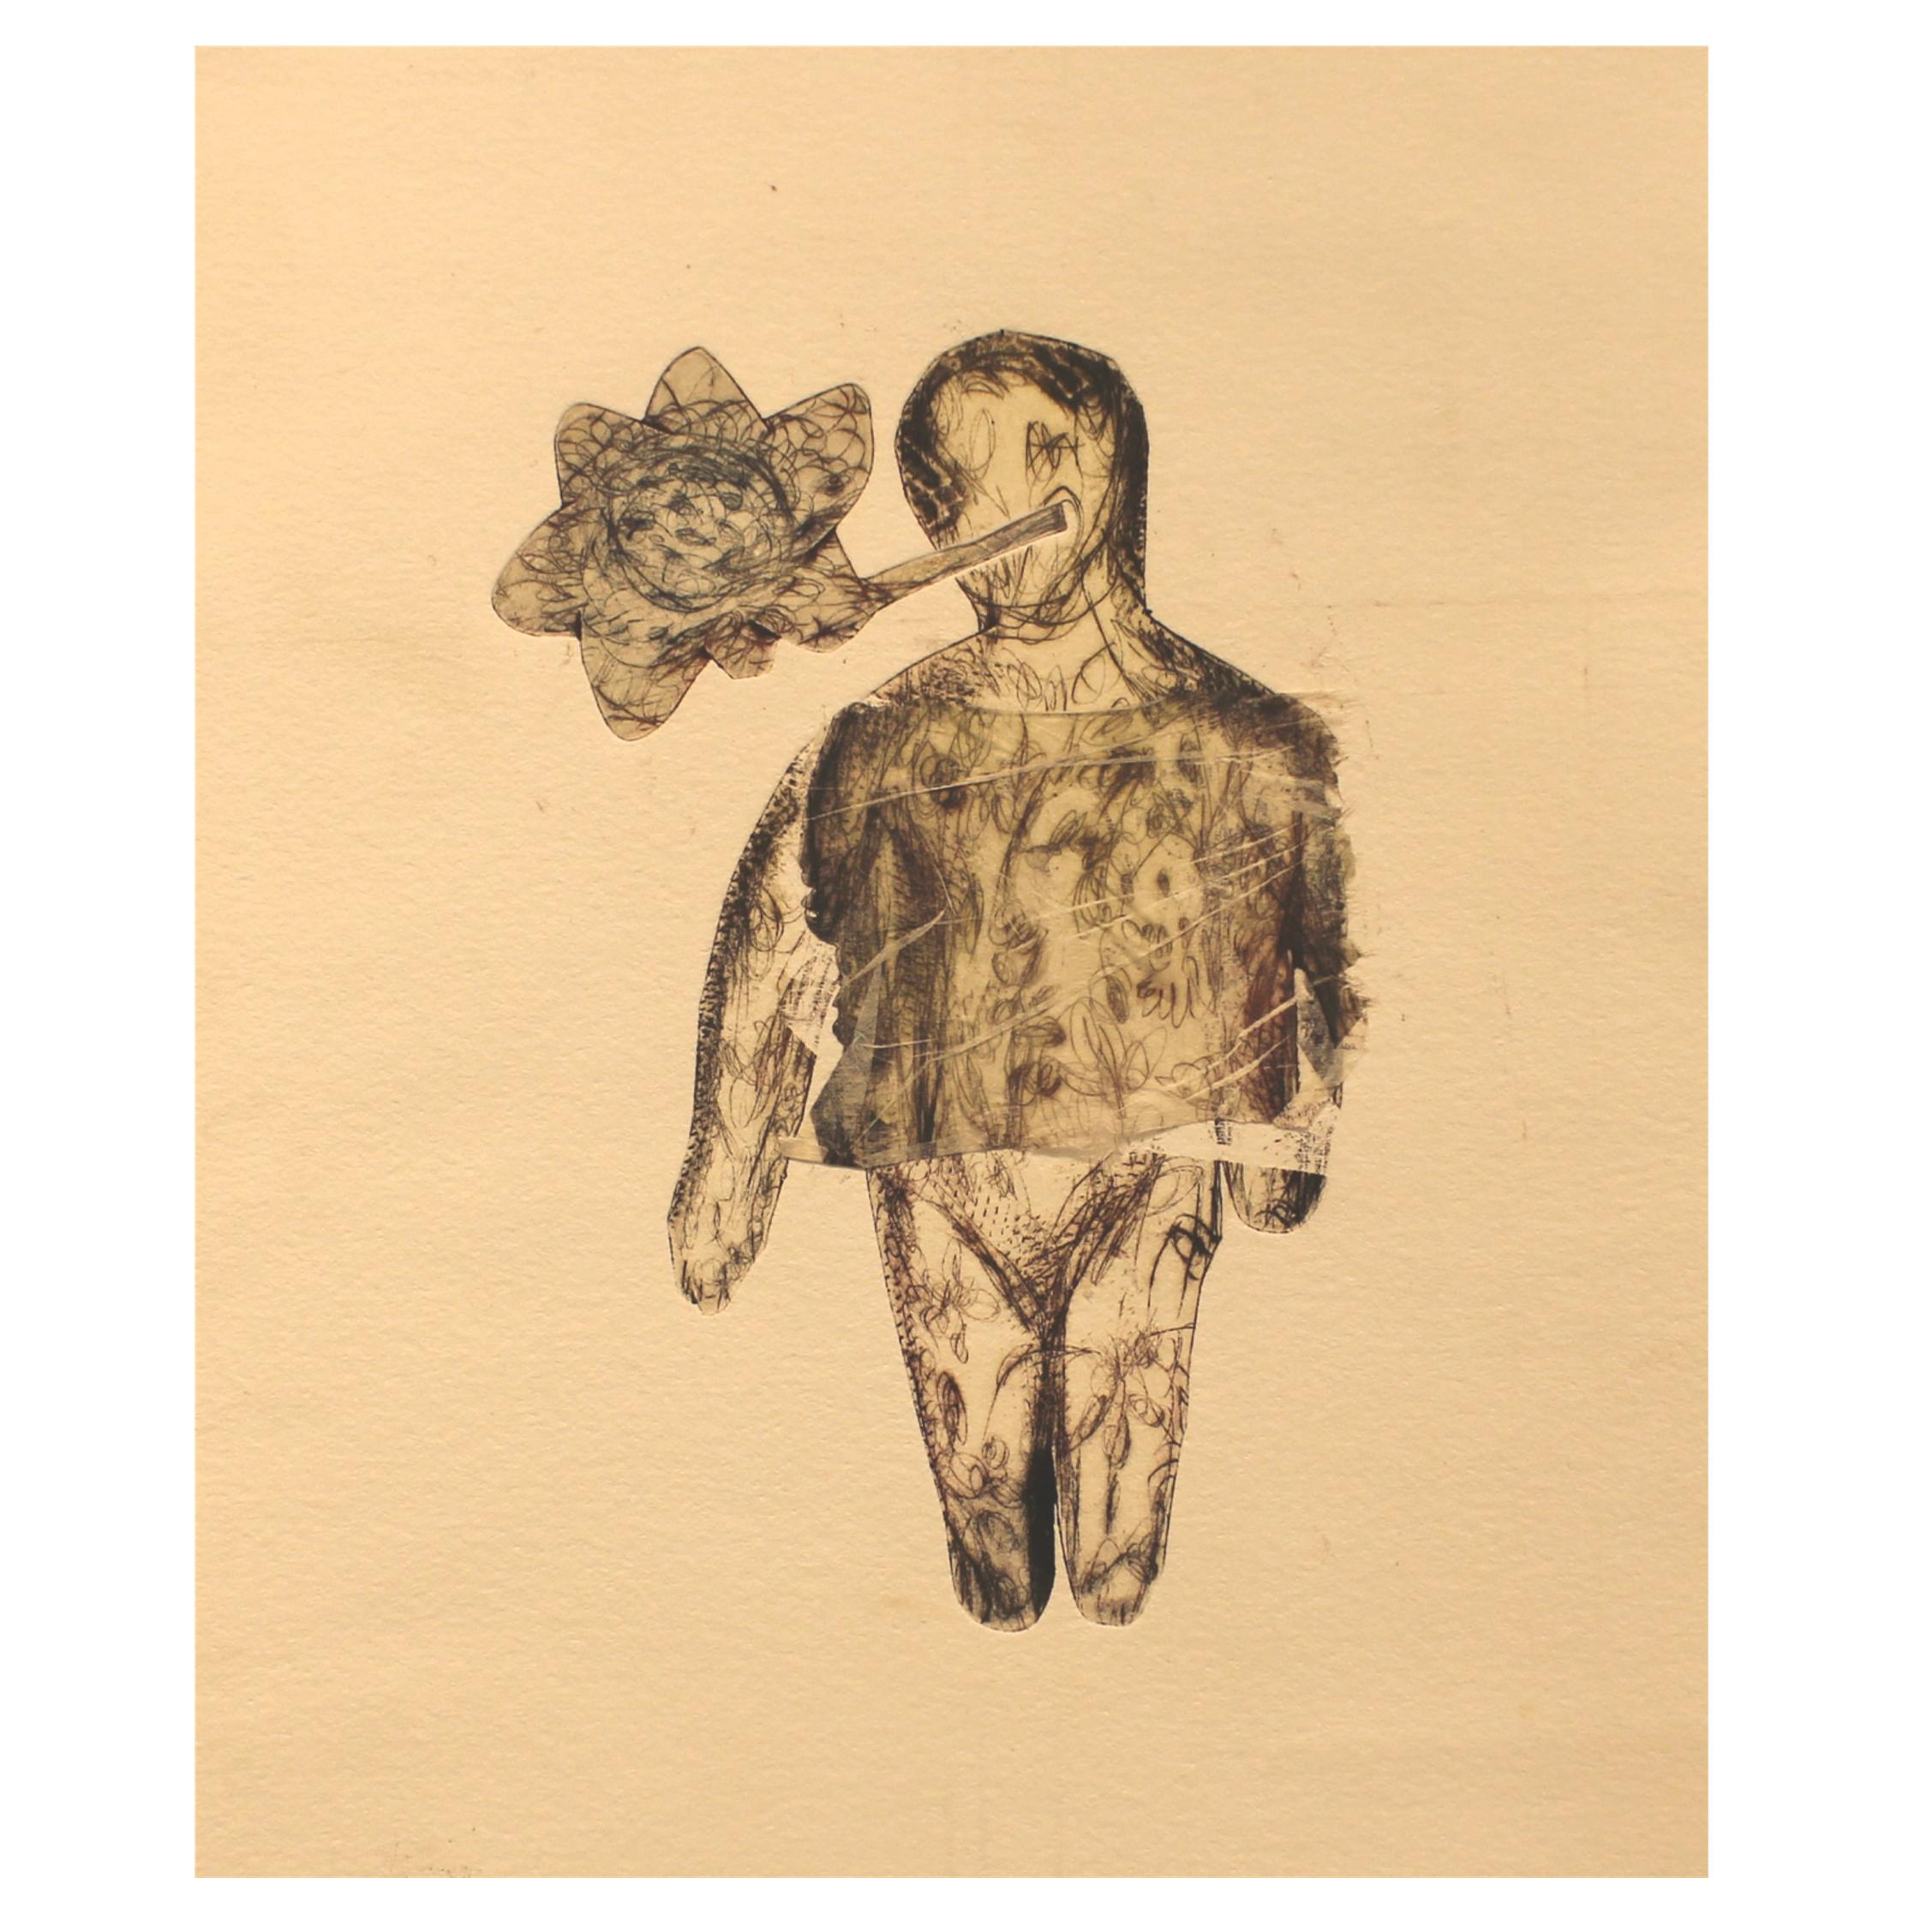 Irina Schestakowich, Nature Baby, 2016, monotype, chine colle